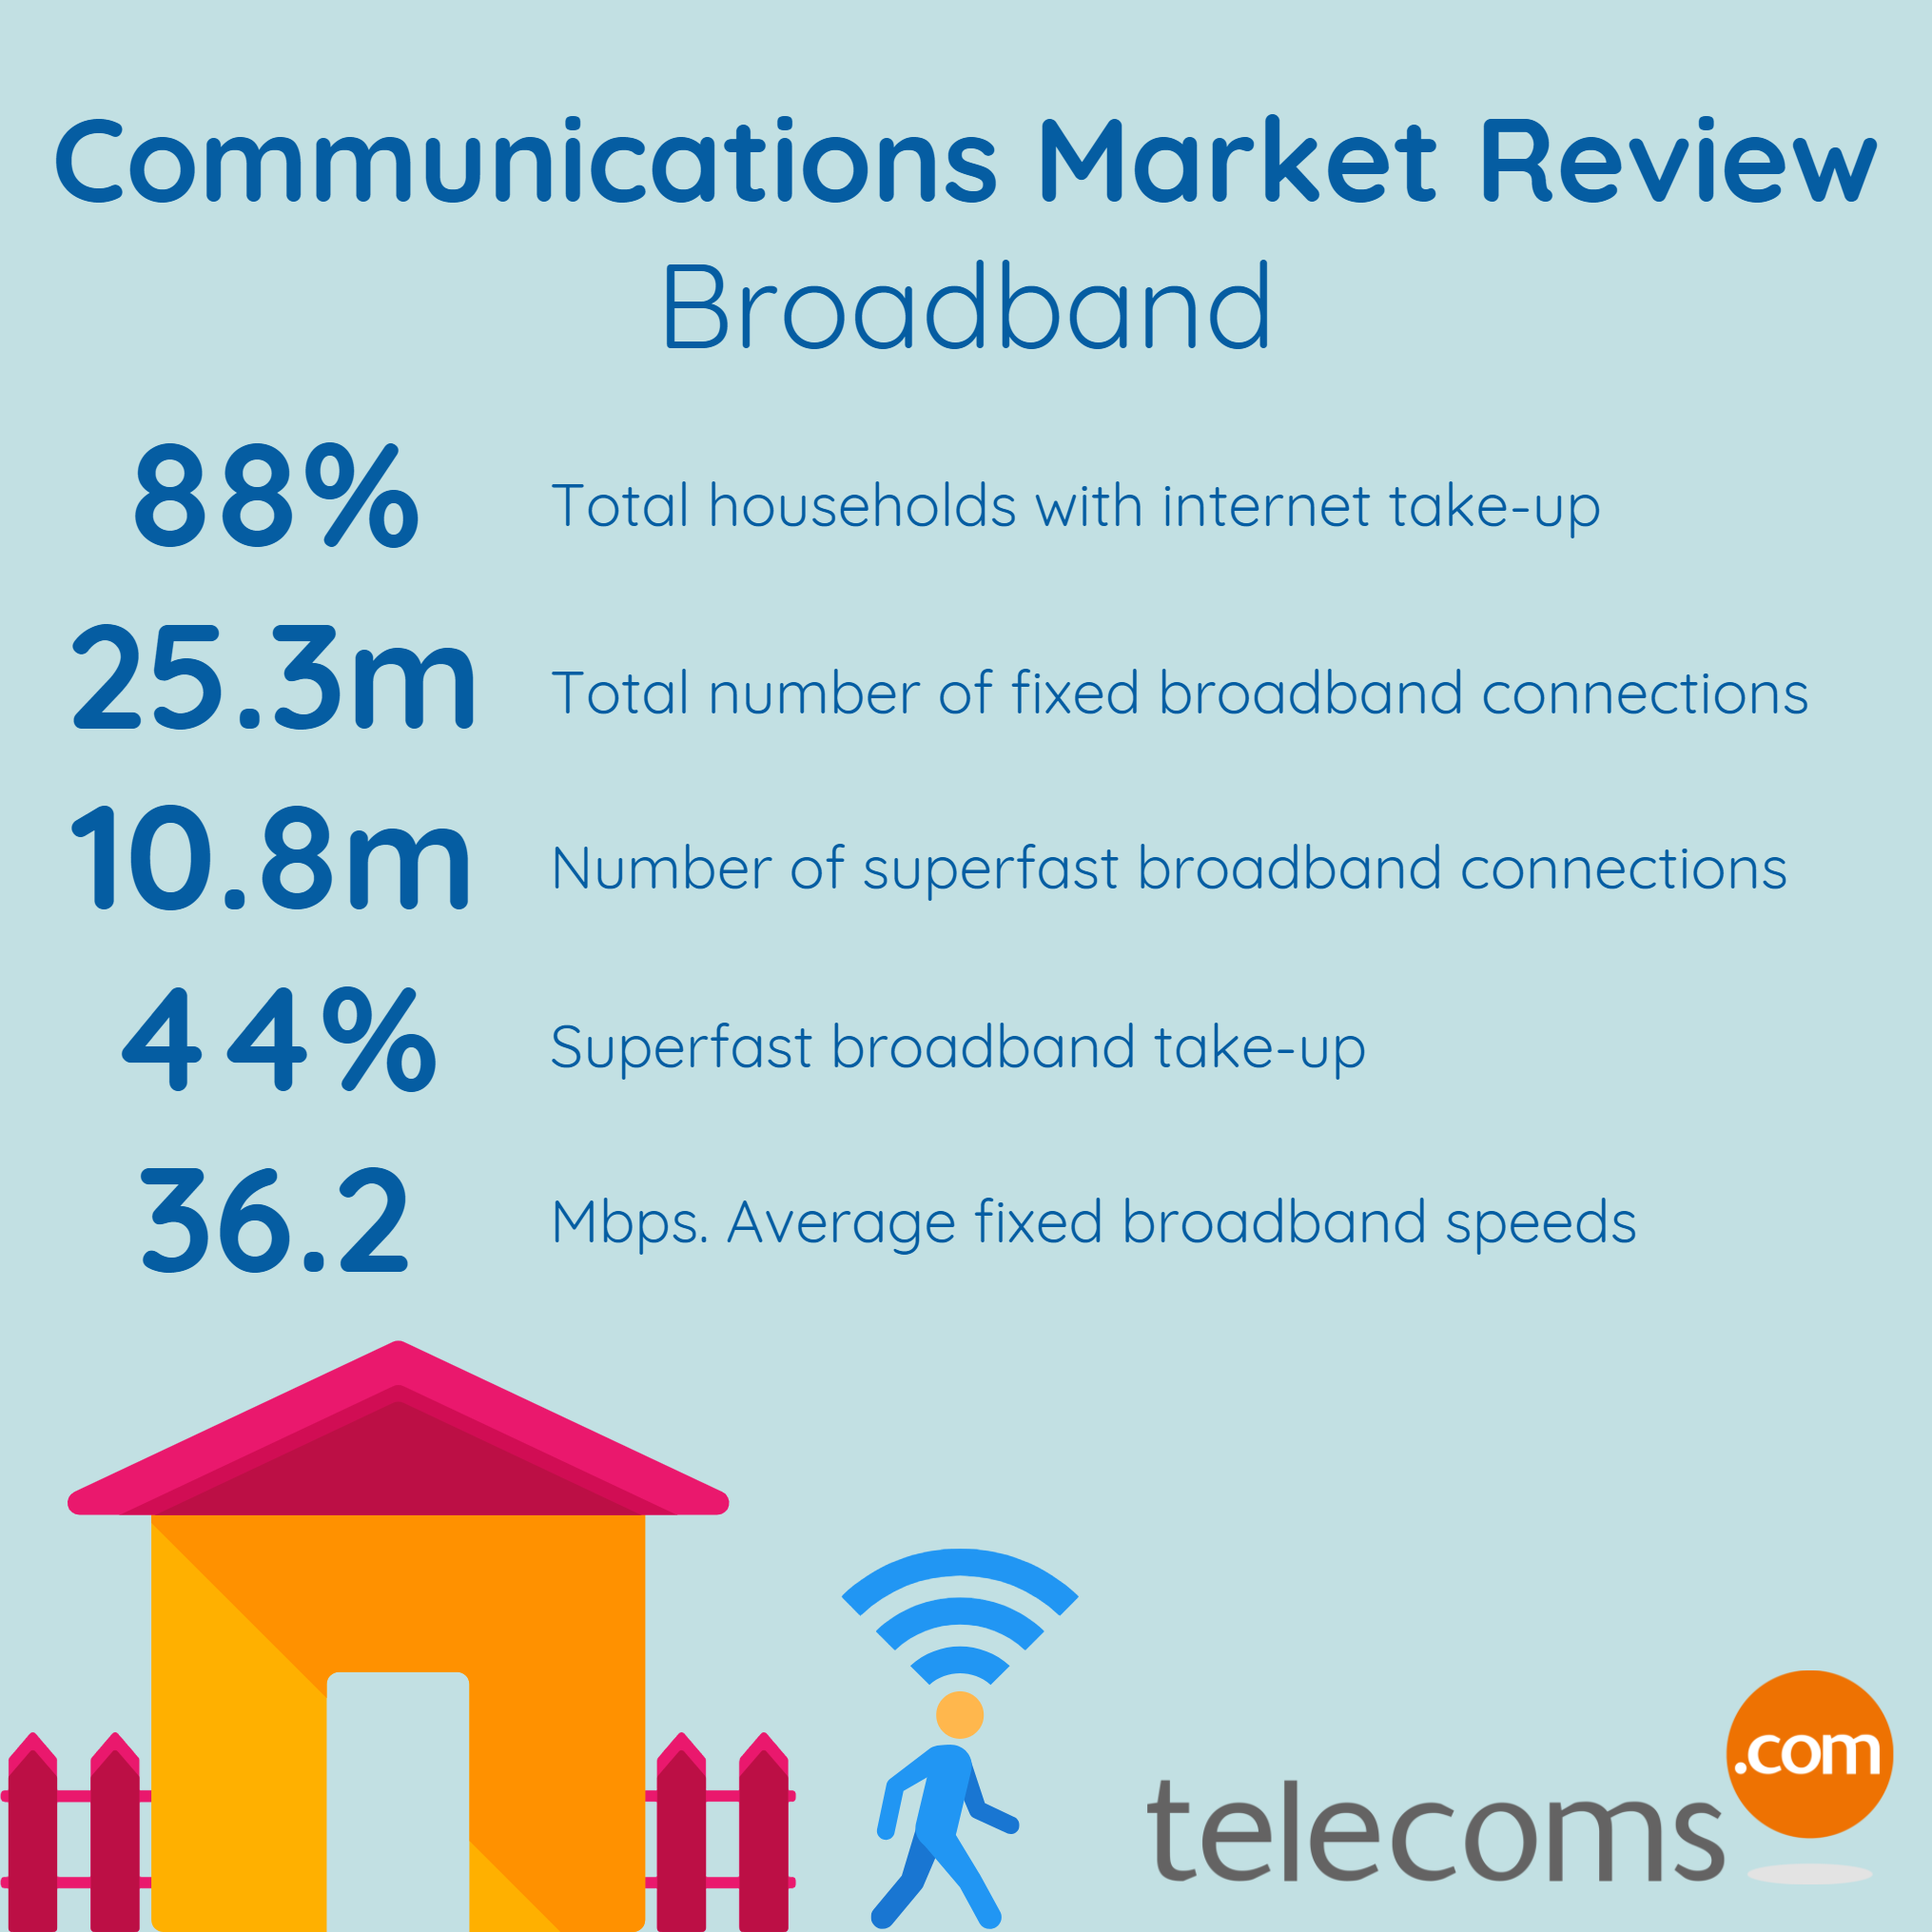 Broadband Market Review